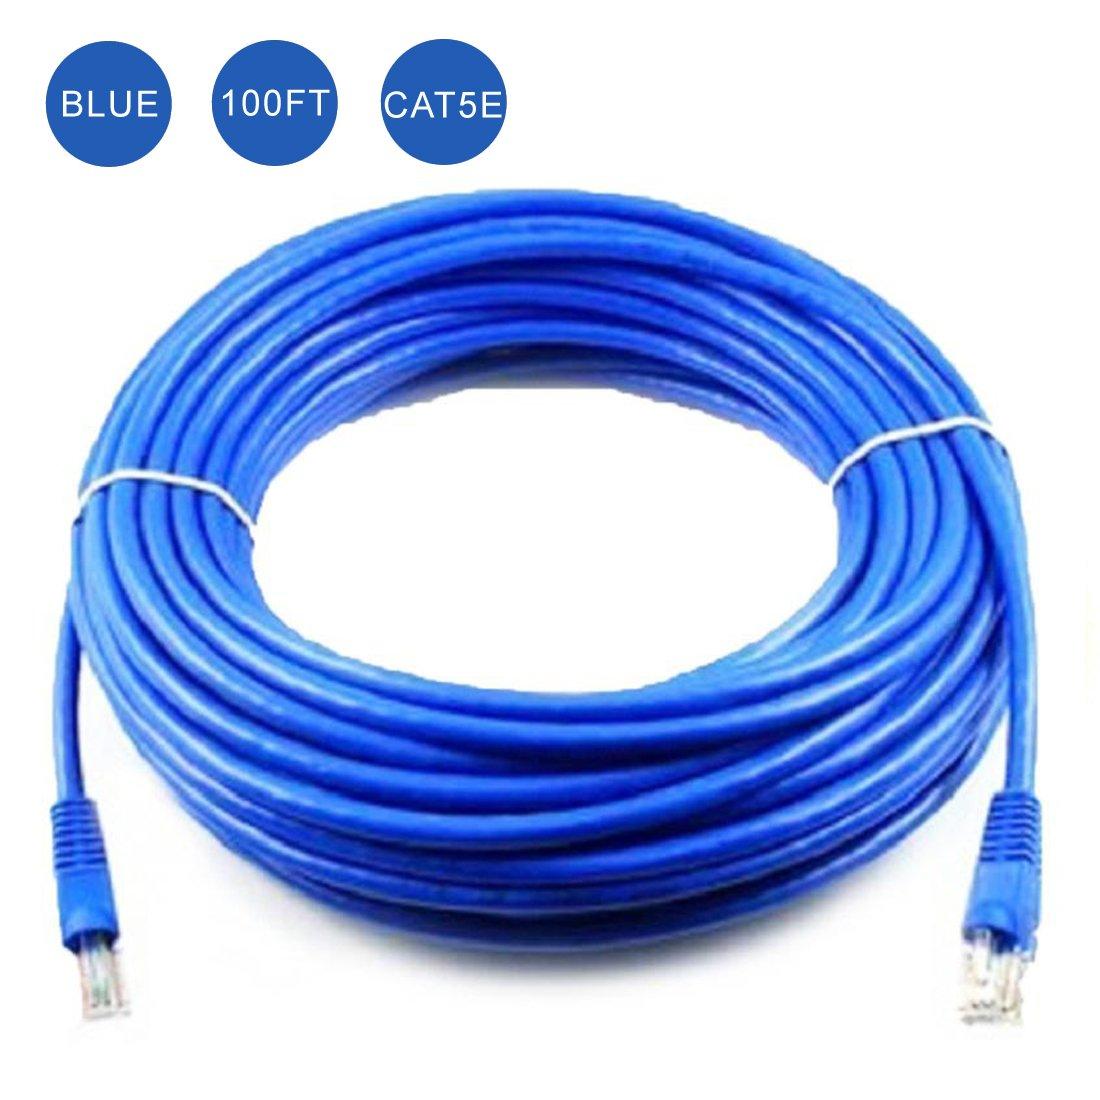 Konex (TM) Ethernet Cable, CAT5e - 100 ft Blue (LAN hardware) EIA568 Patch Cable, RJ45 / RJ45 100' Blue for 10 Base-T, 100 Base-T RJ45 / RJ45 100' Blue for 10 Base-T DIGIPARTS 10-059